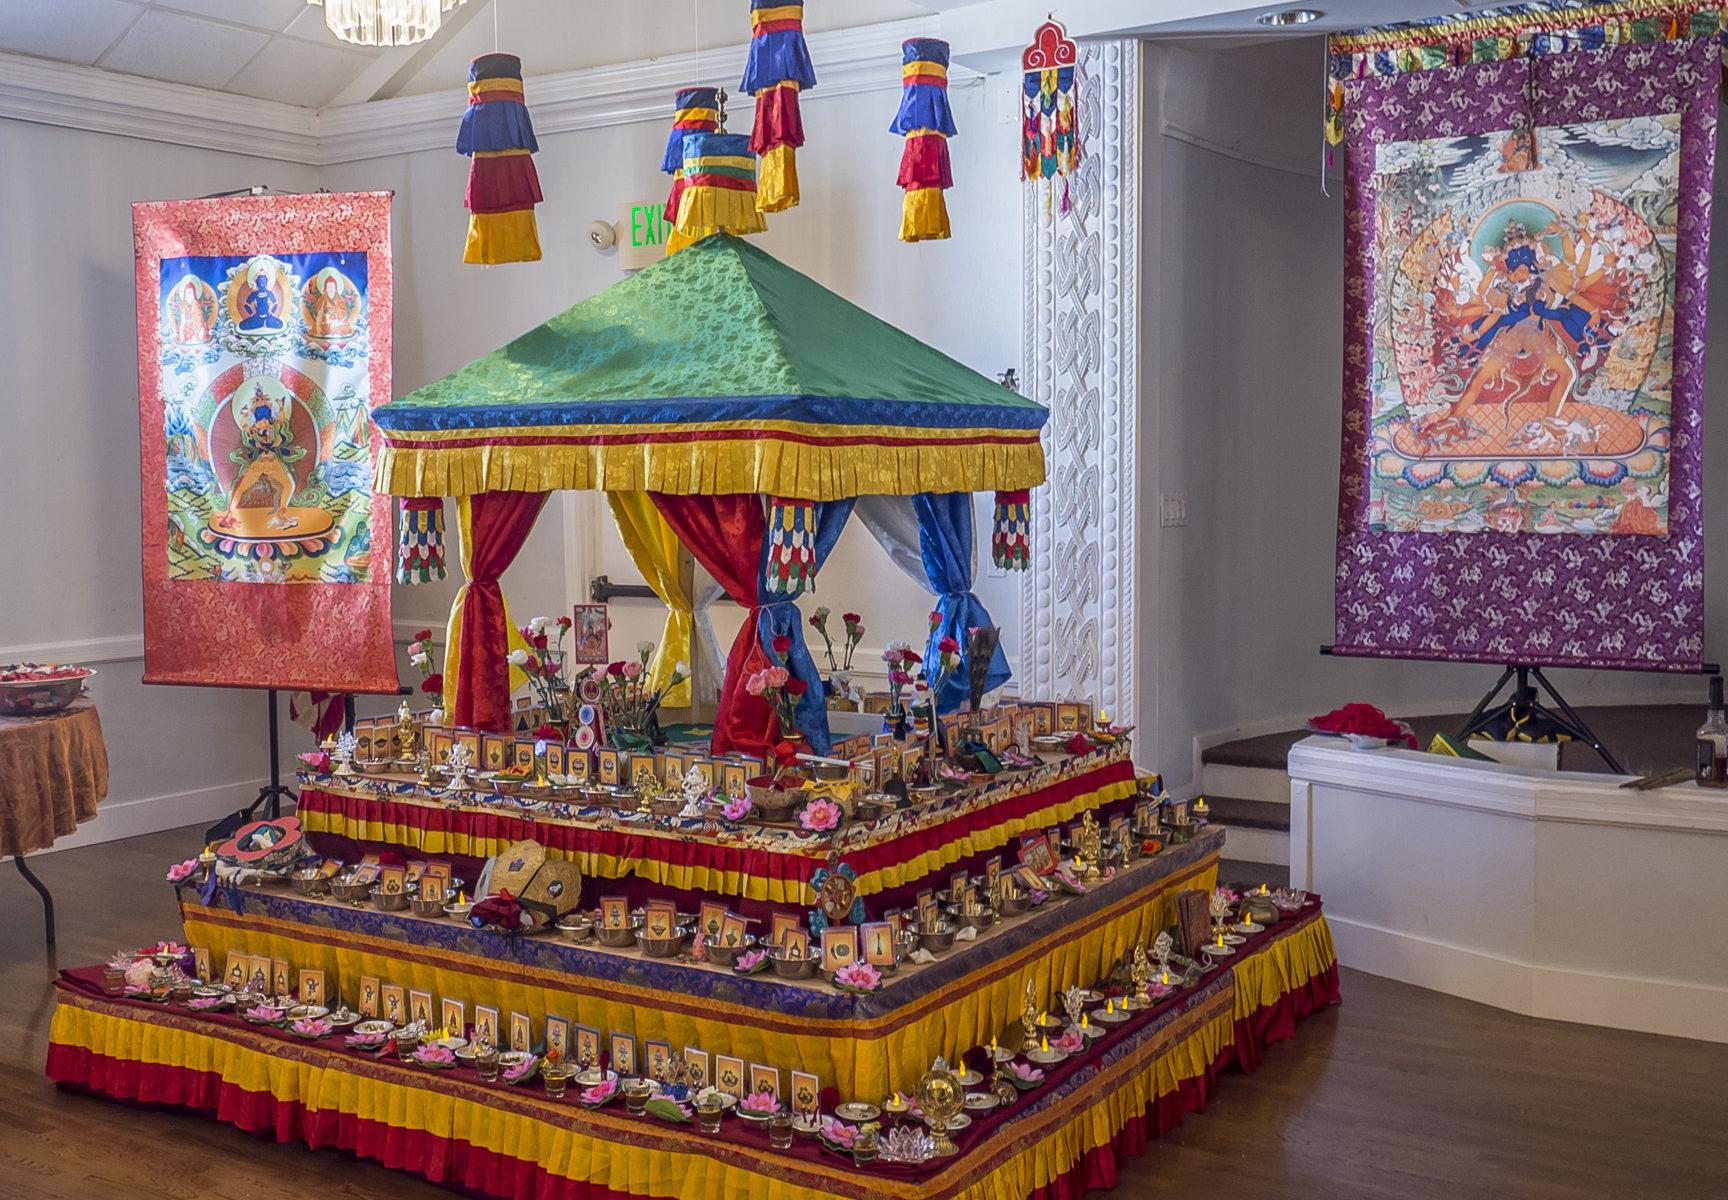 Kalachakra Mandala House